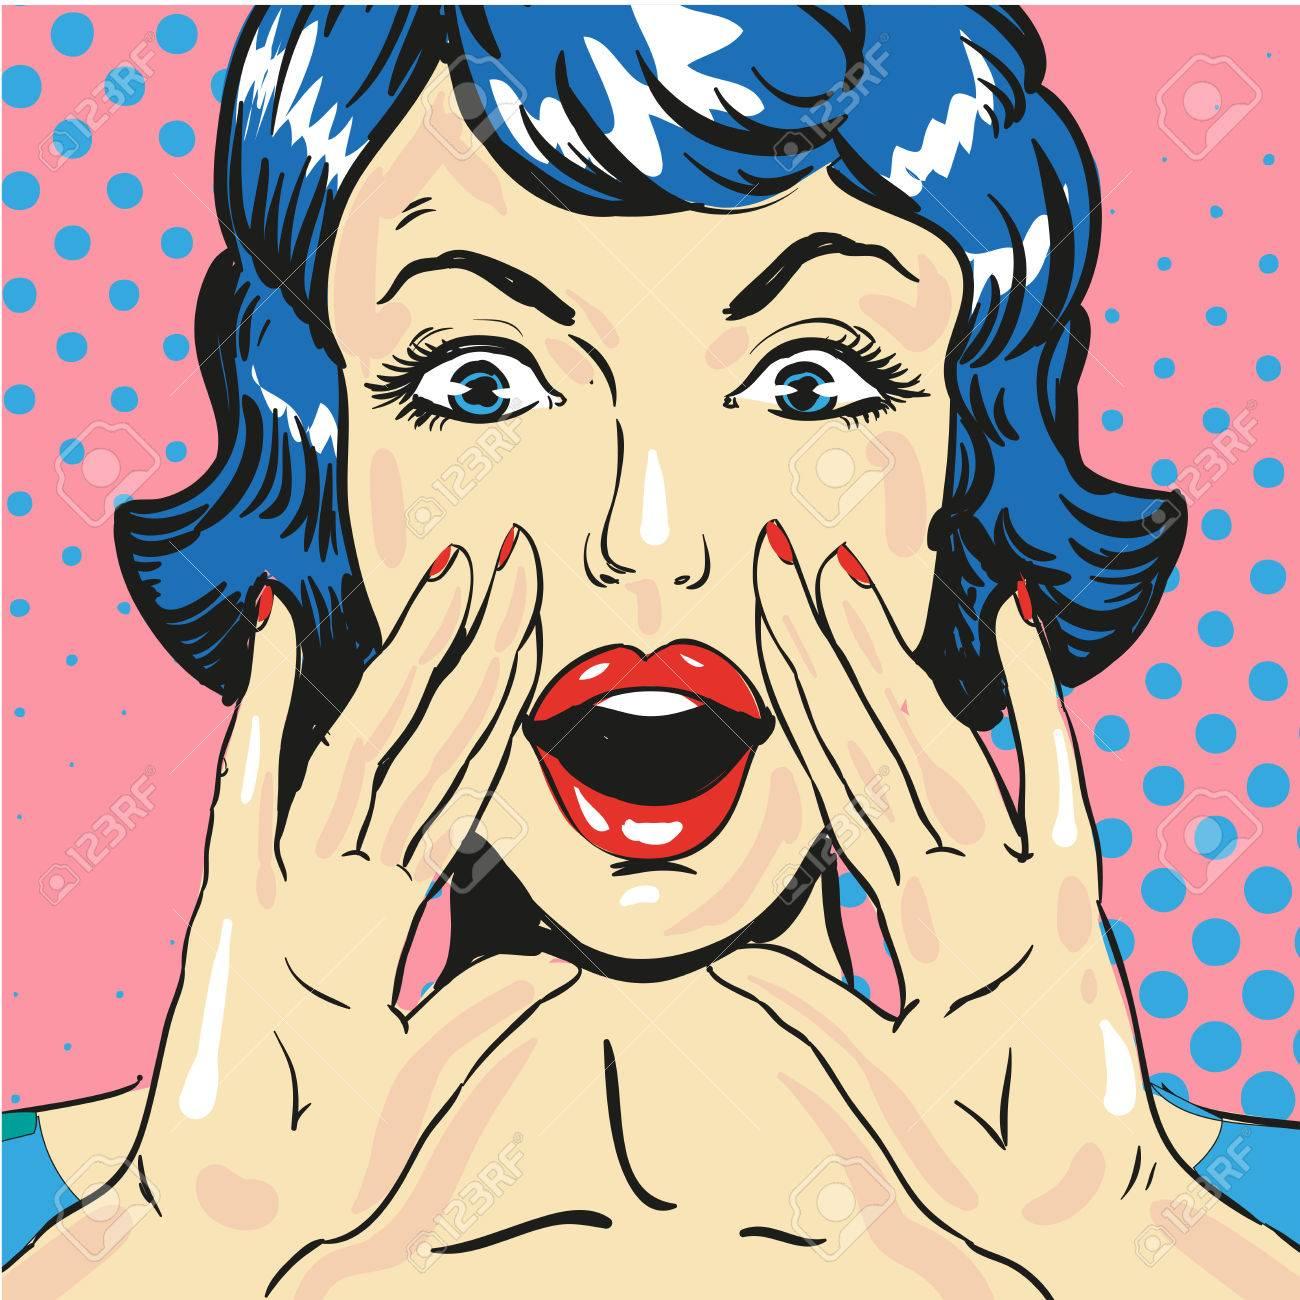 Woman screaming announcing news pop art comic style vector - 76173733